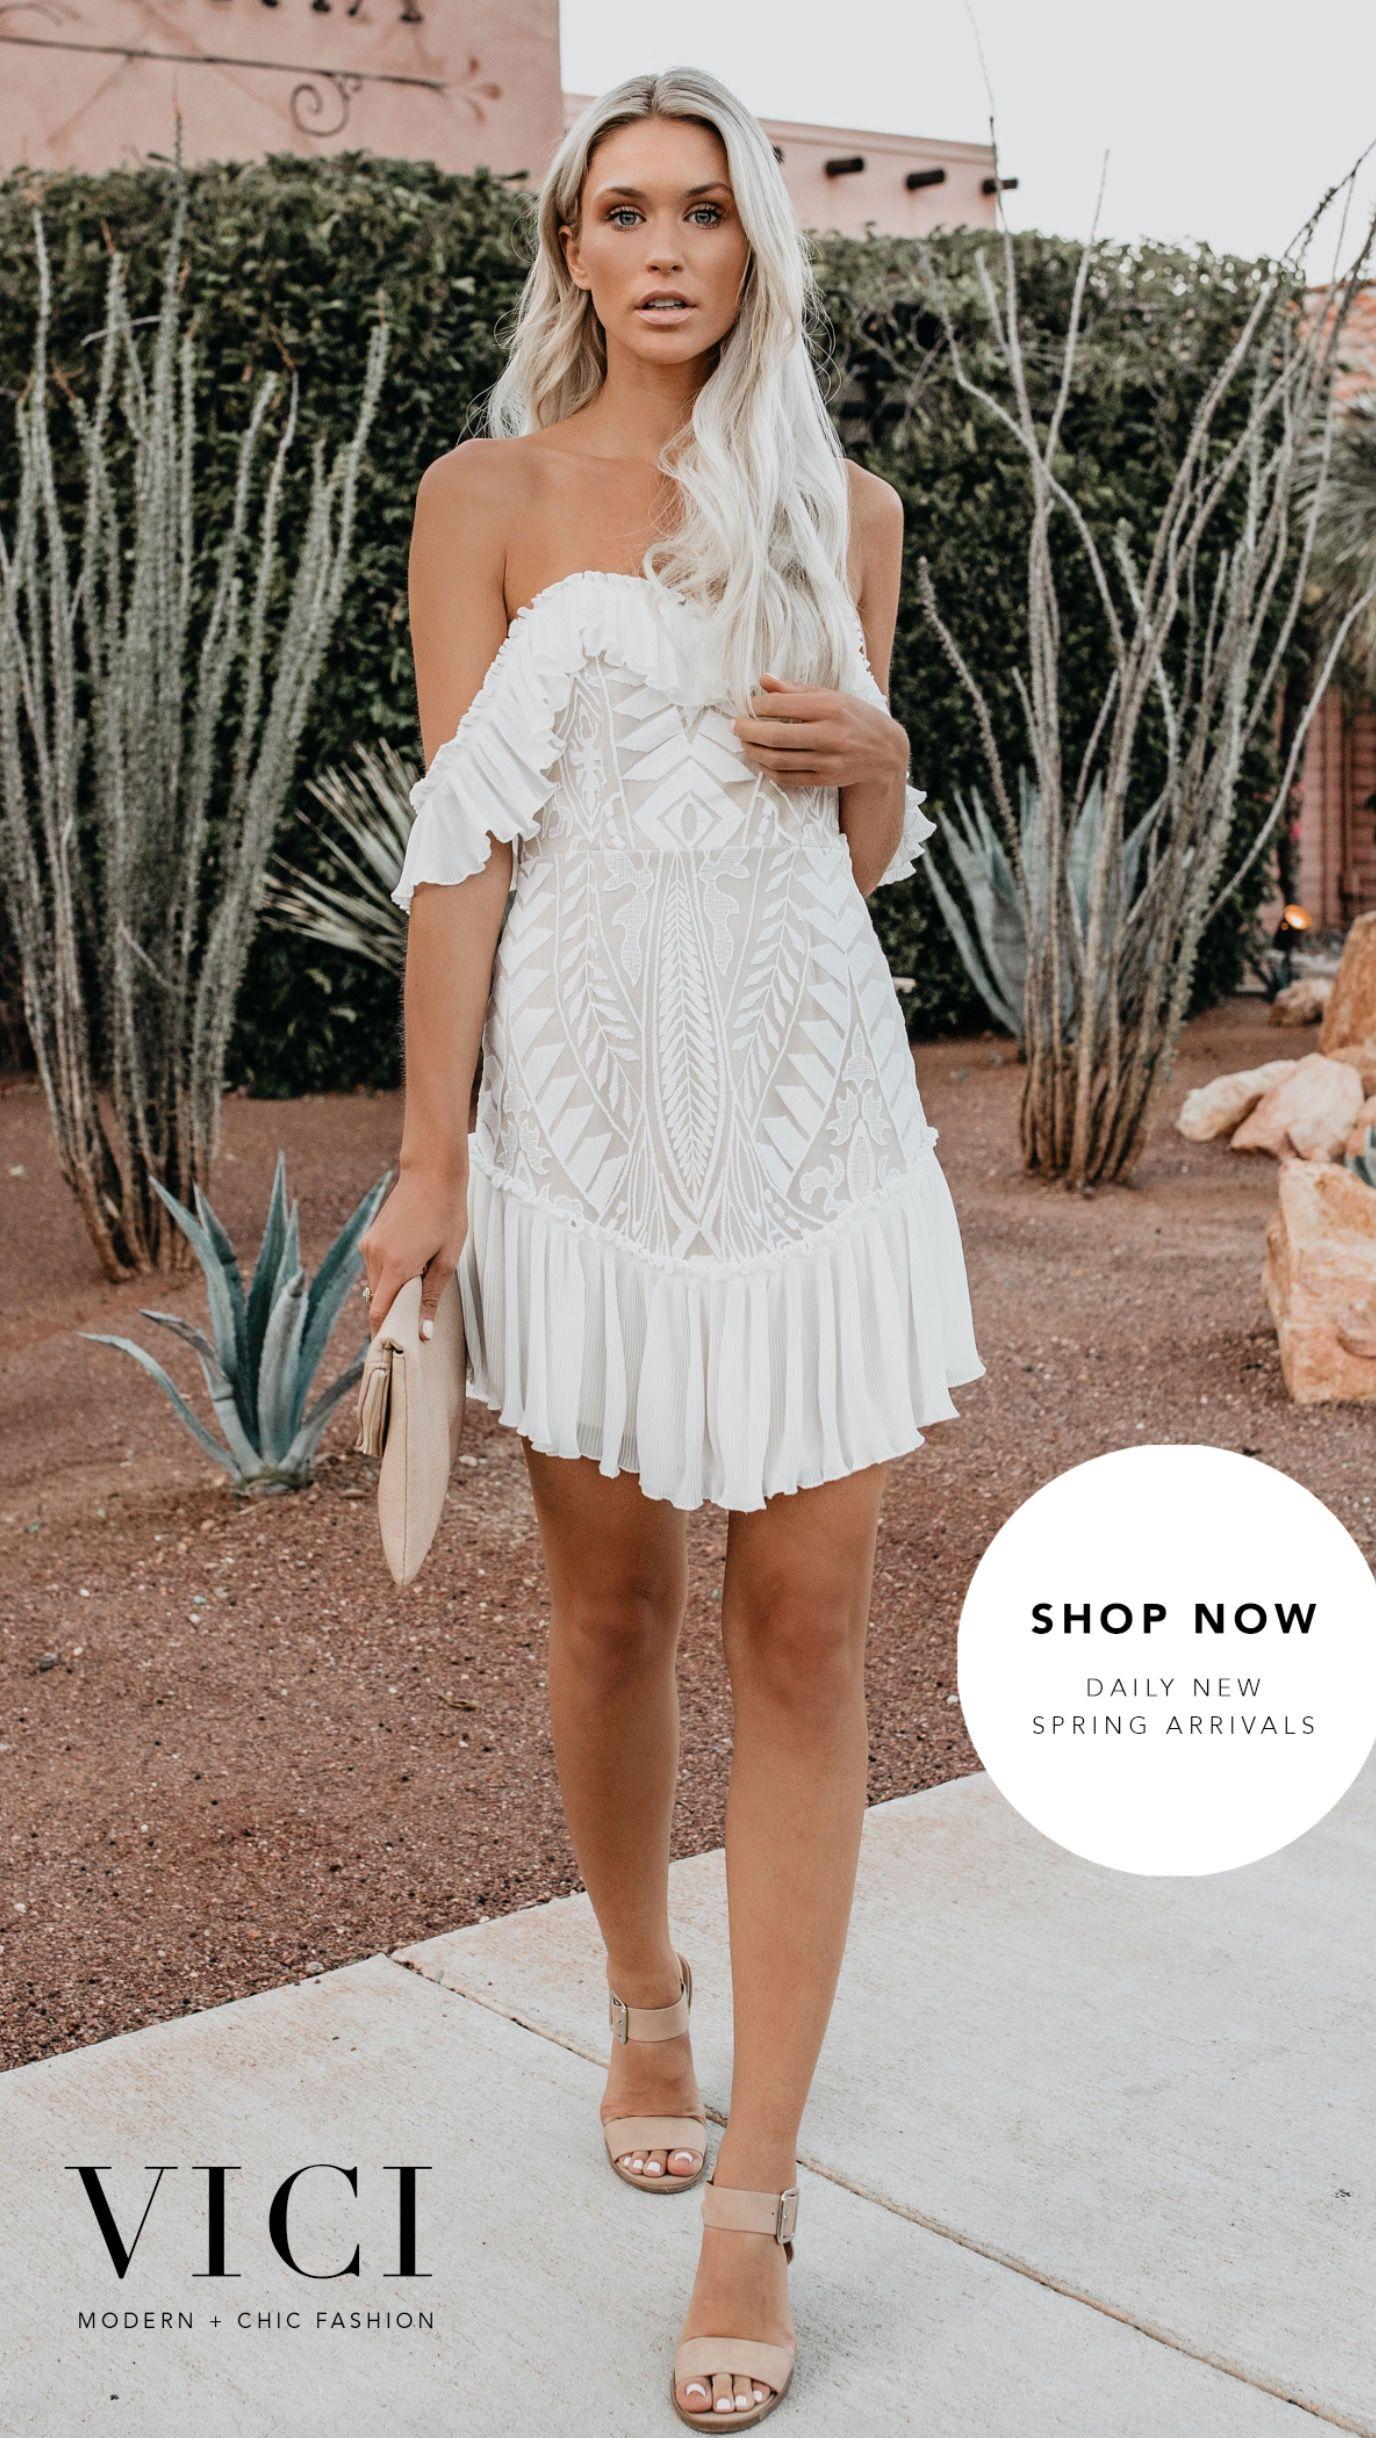 Pin By Savannah Cader On Fashionnn Simple Dresses Cute Wedding Dress Dresses,Cost Of Wedding Dress Of Isha Ambani